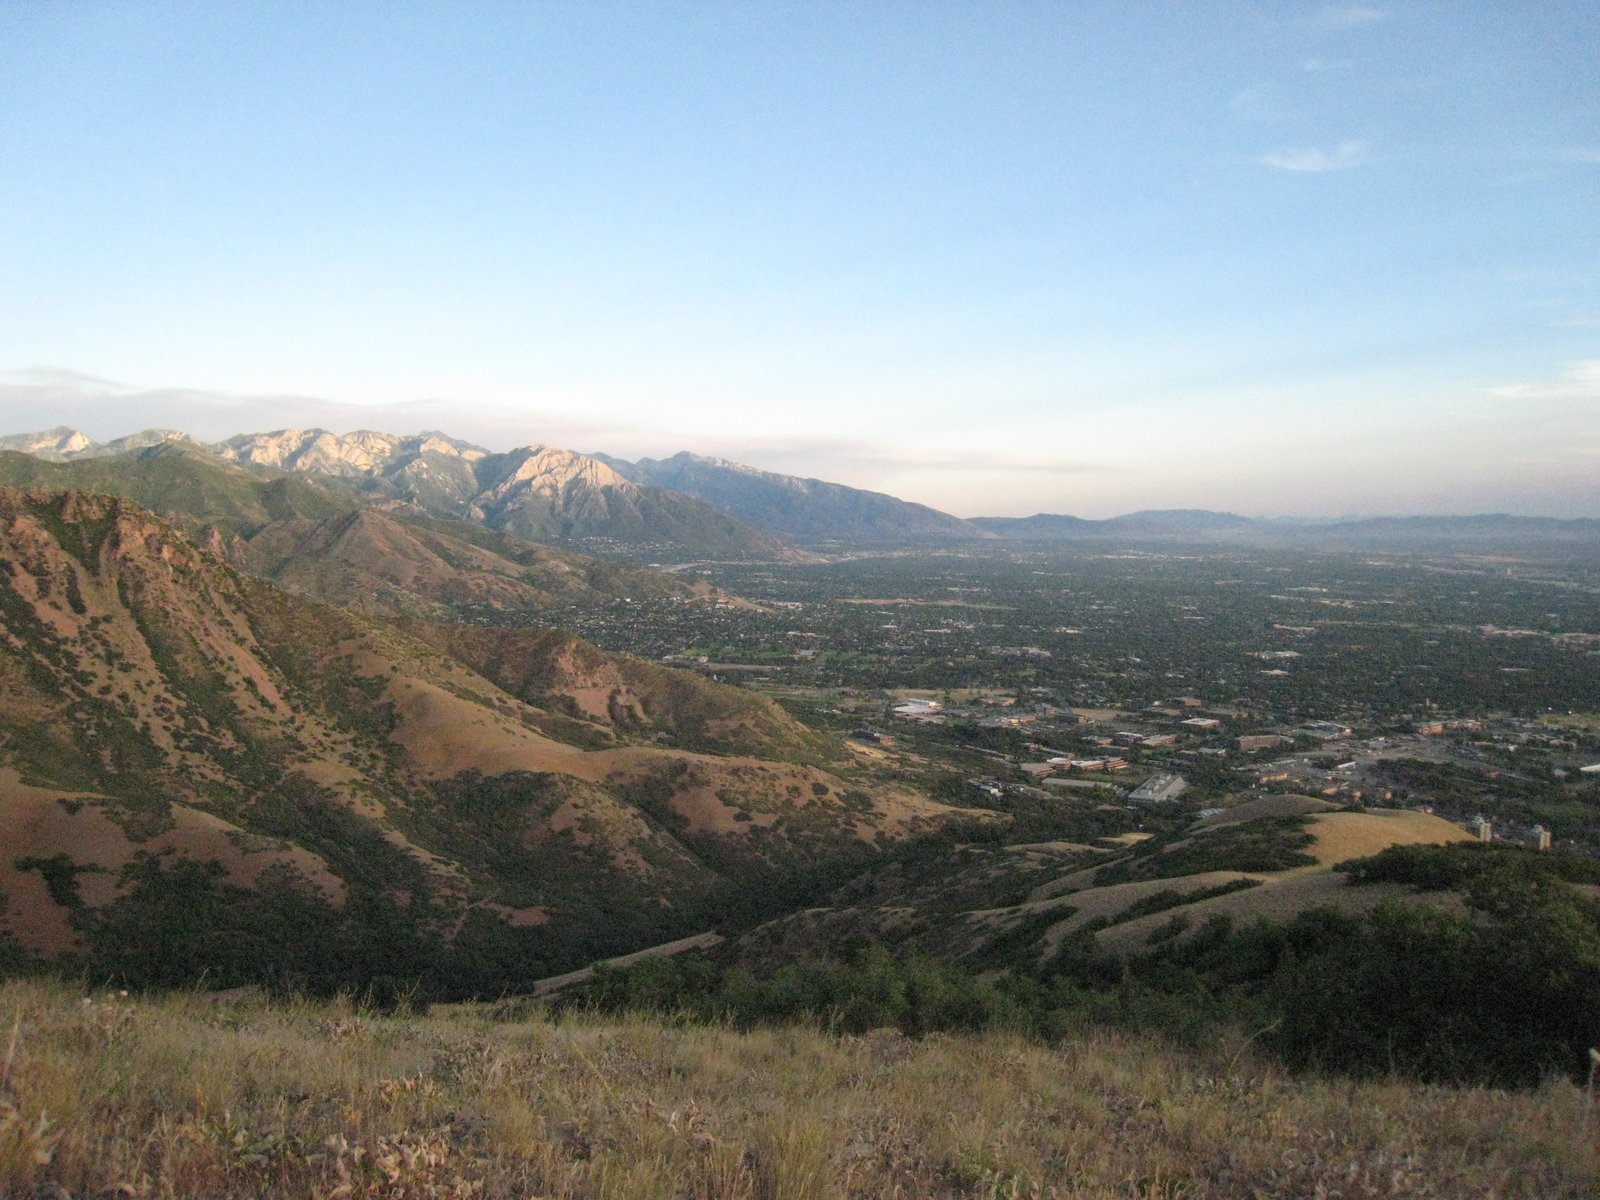 Ummm Salt Lake City.....